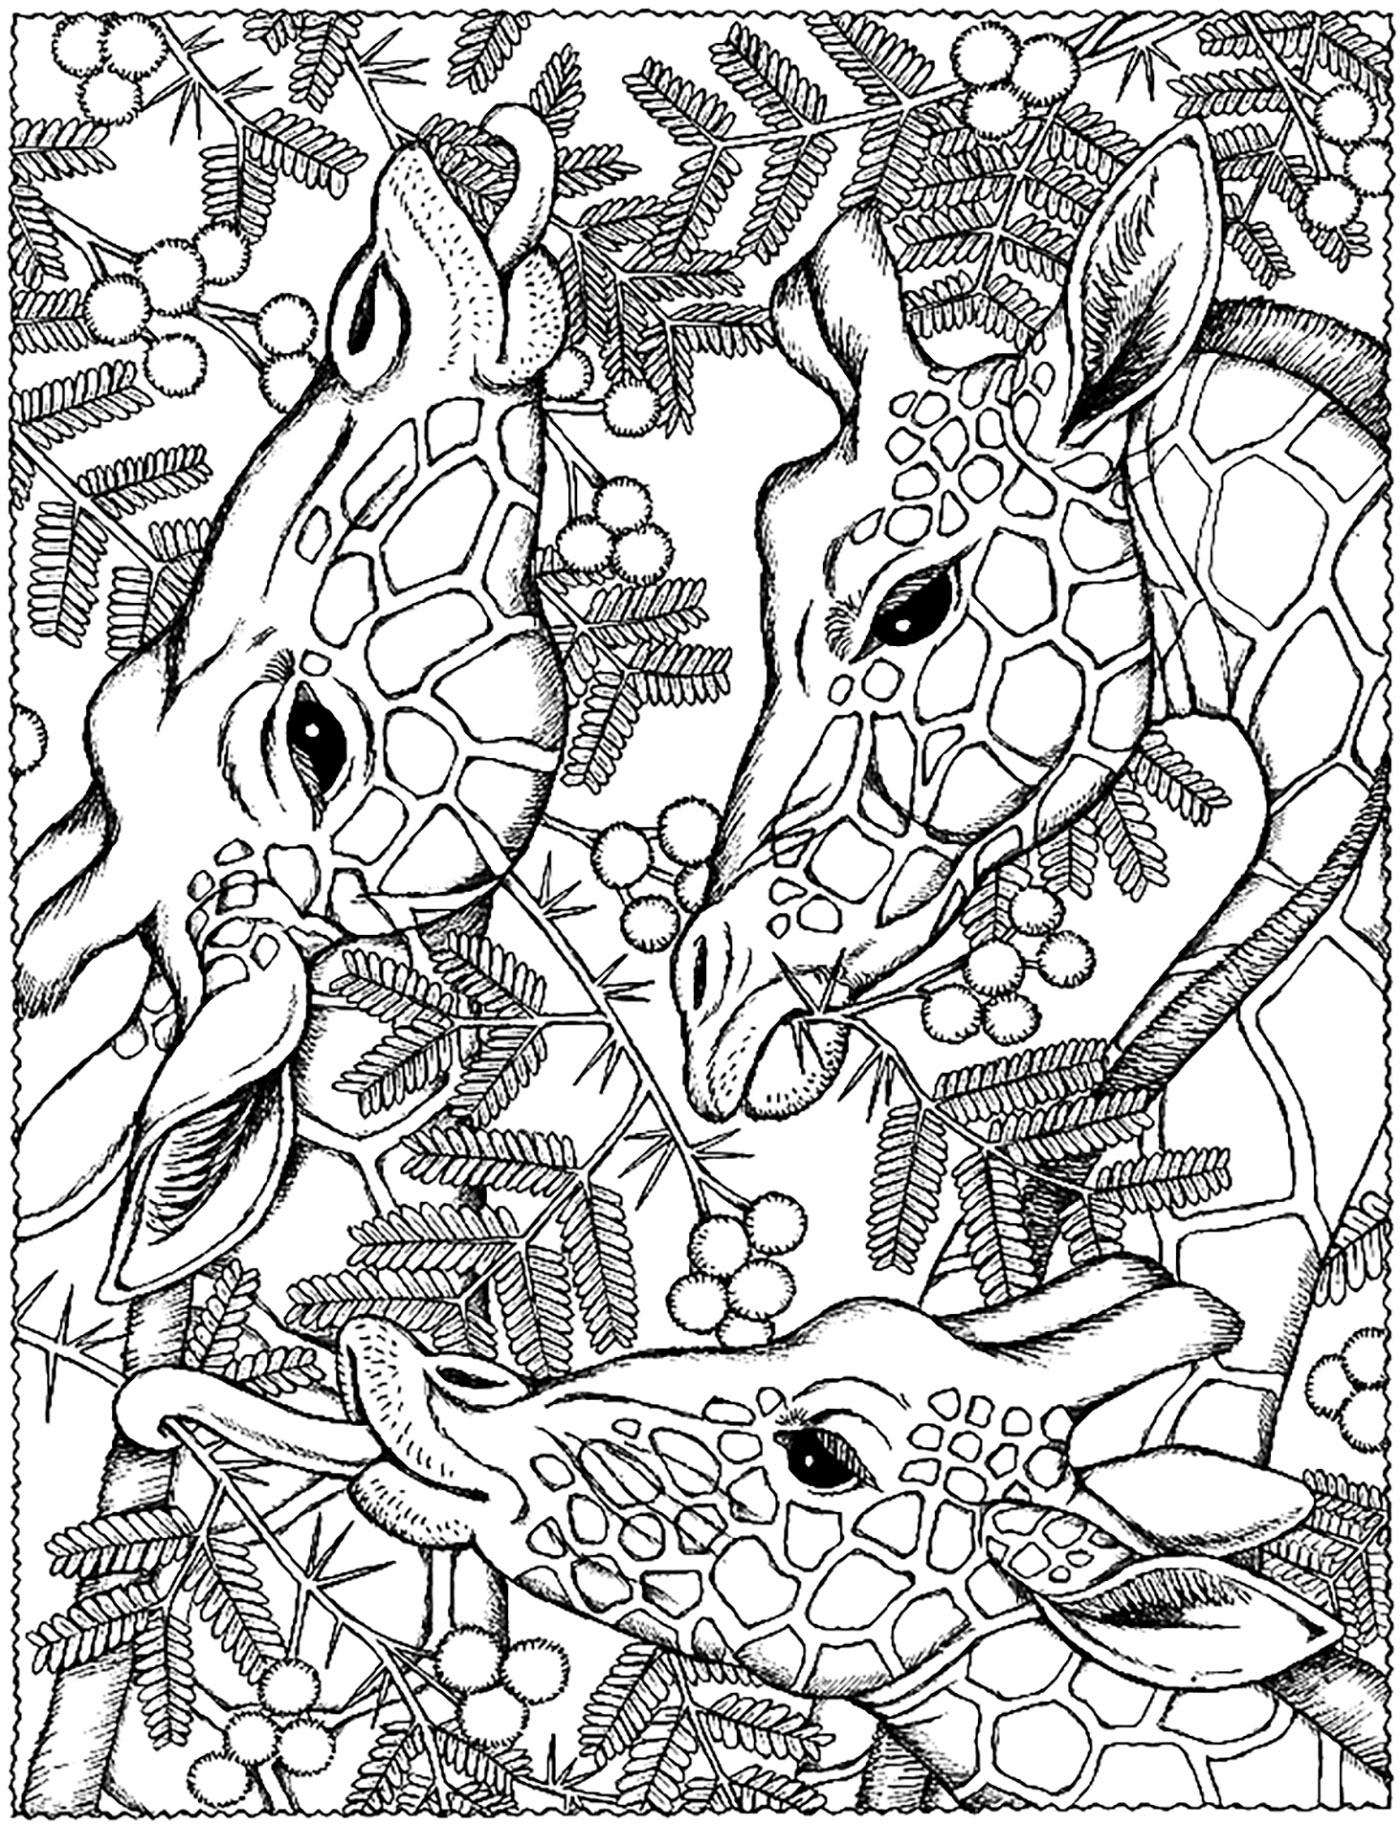 Colorear para adultos : Jirafas - 1